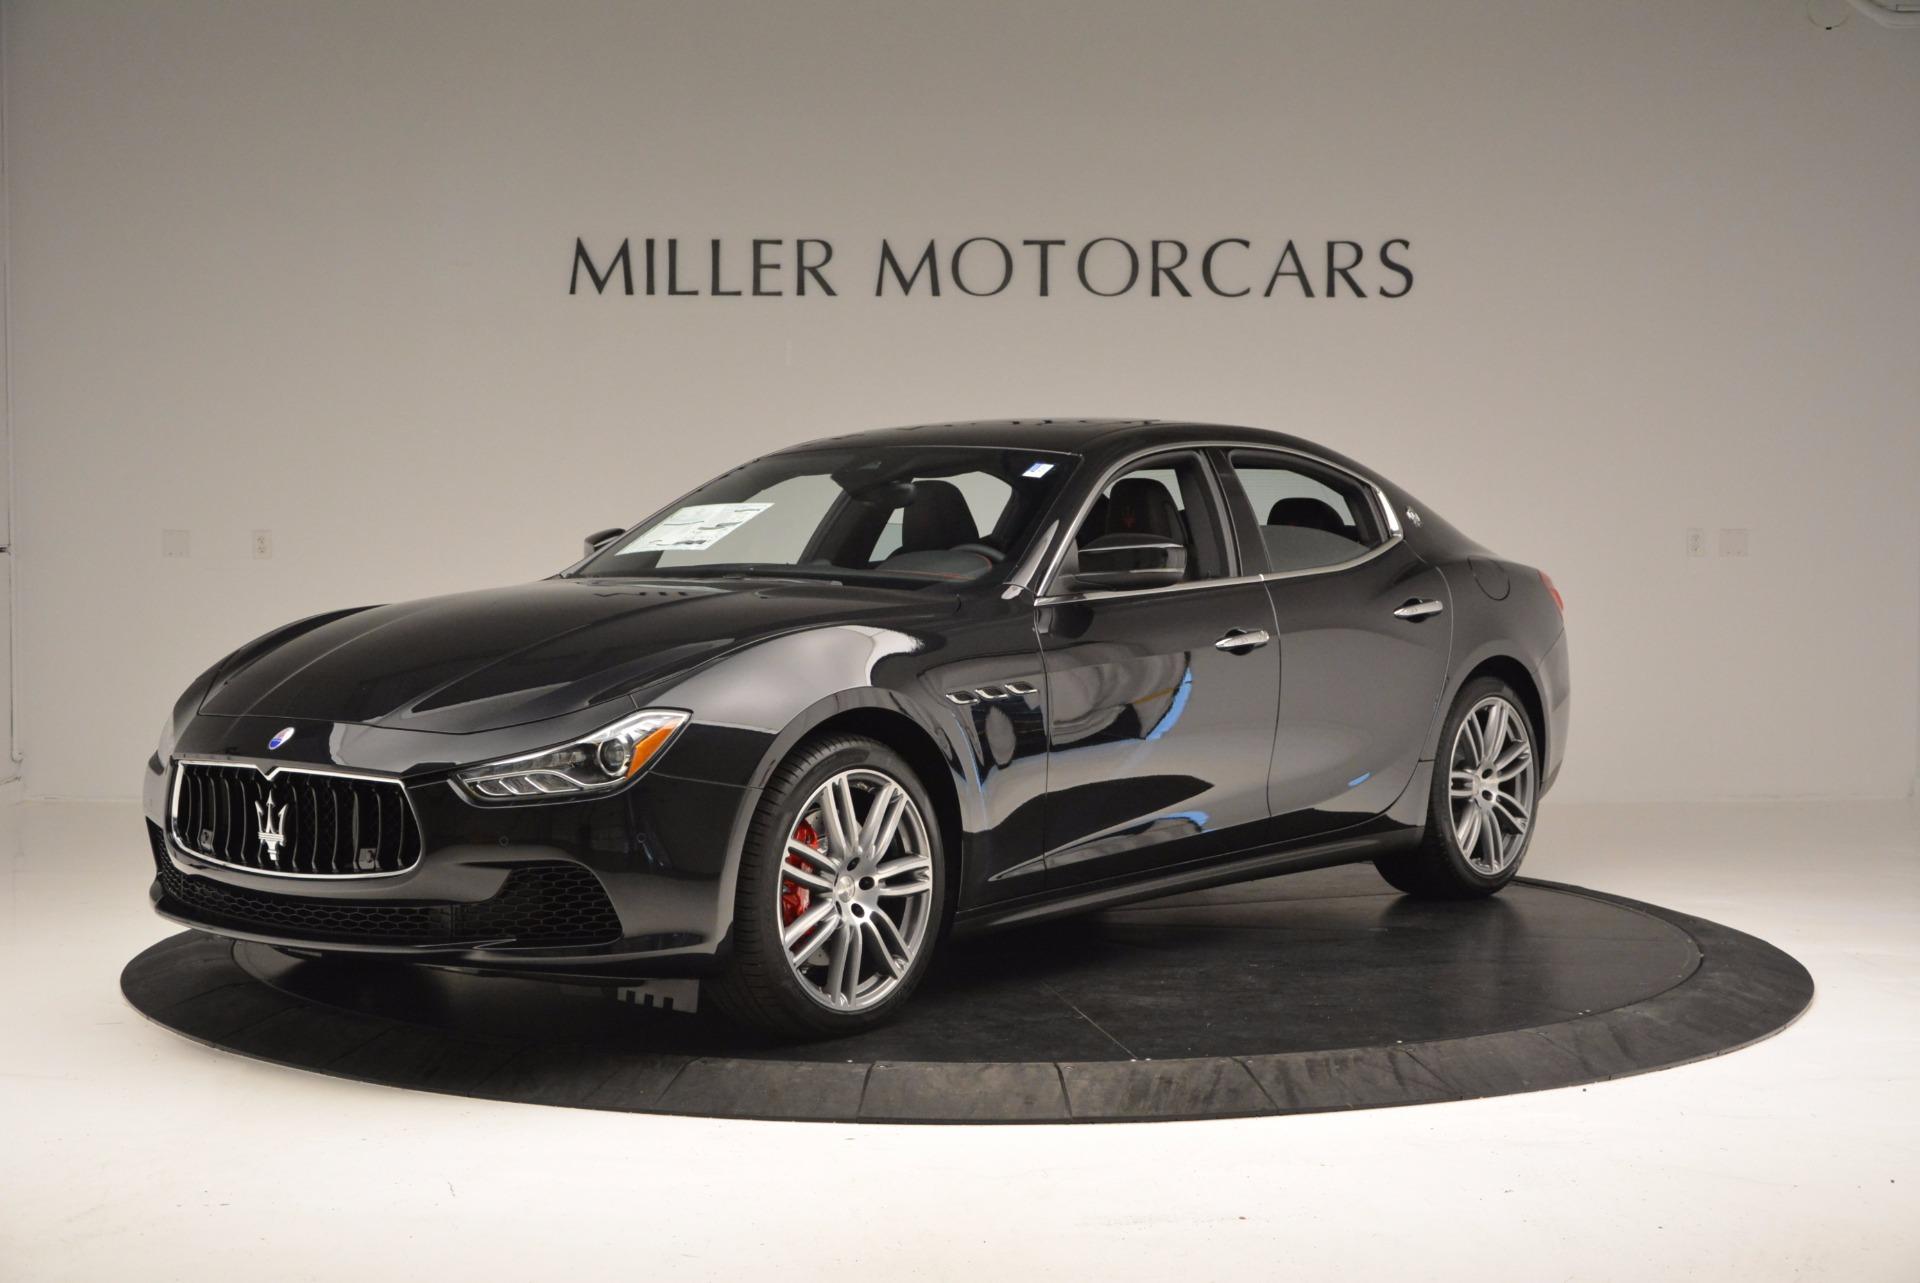 Used 2017 Maserati Ghibli S Q4 for sale $44,900 at McLaren Greenwich in Greenwich CT 06830 1